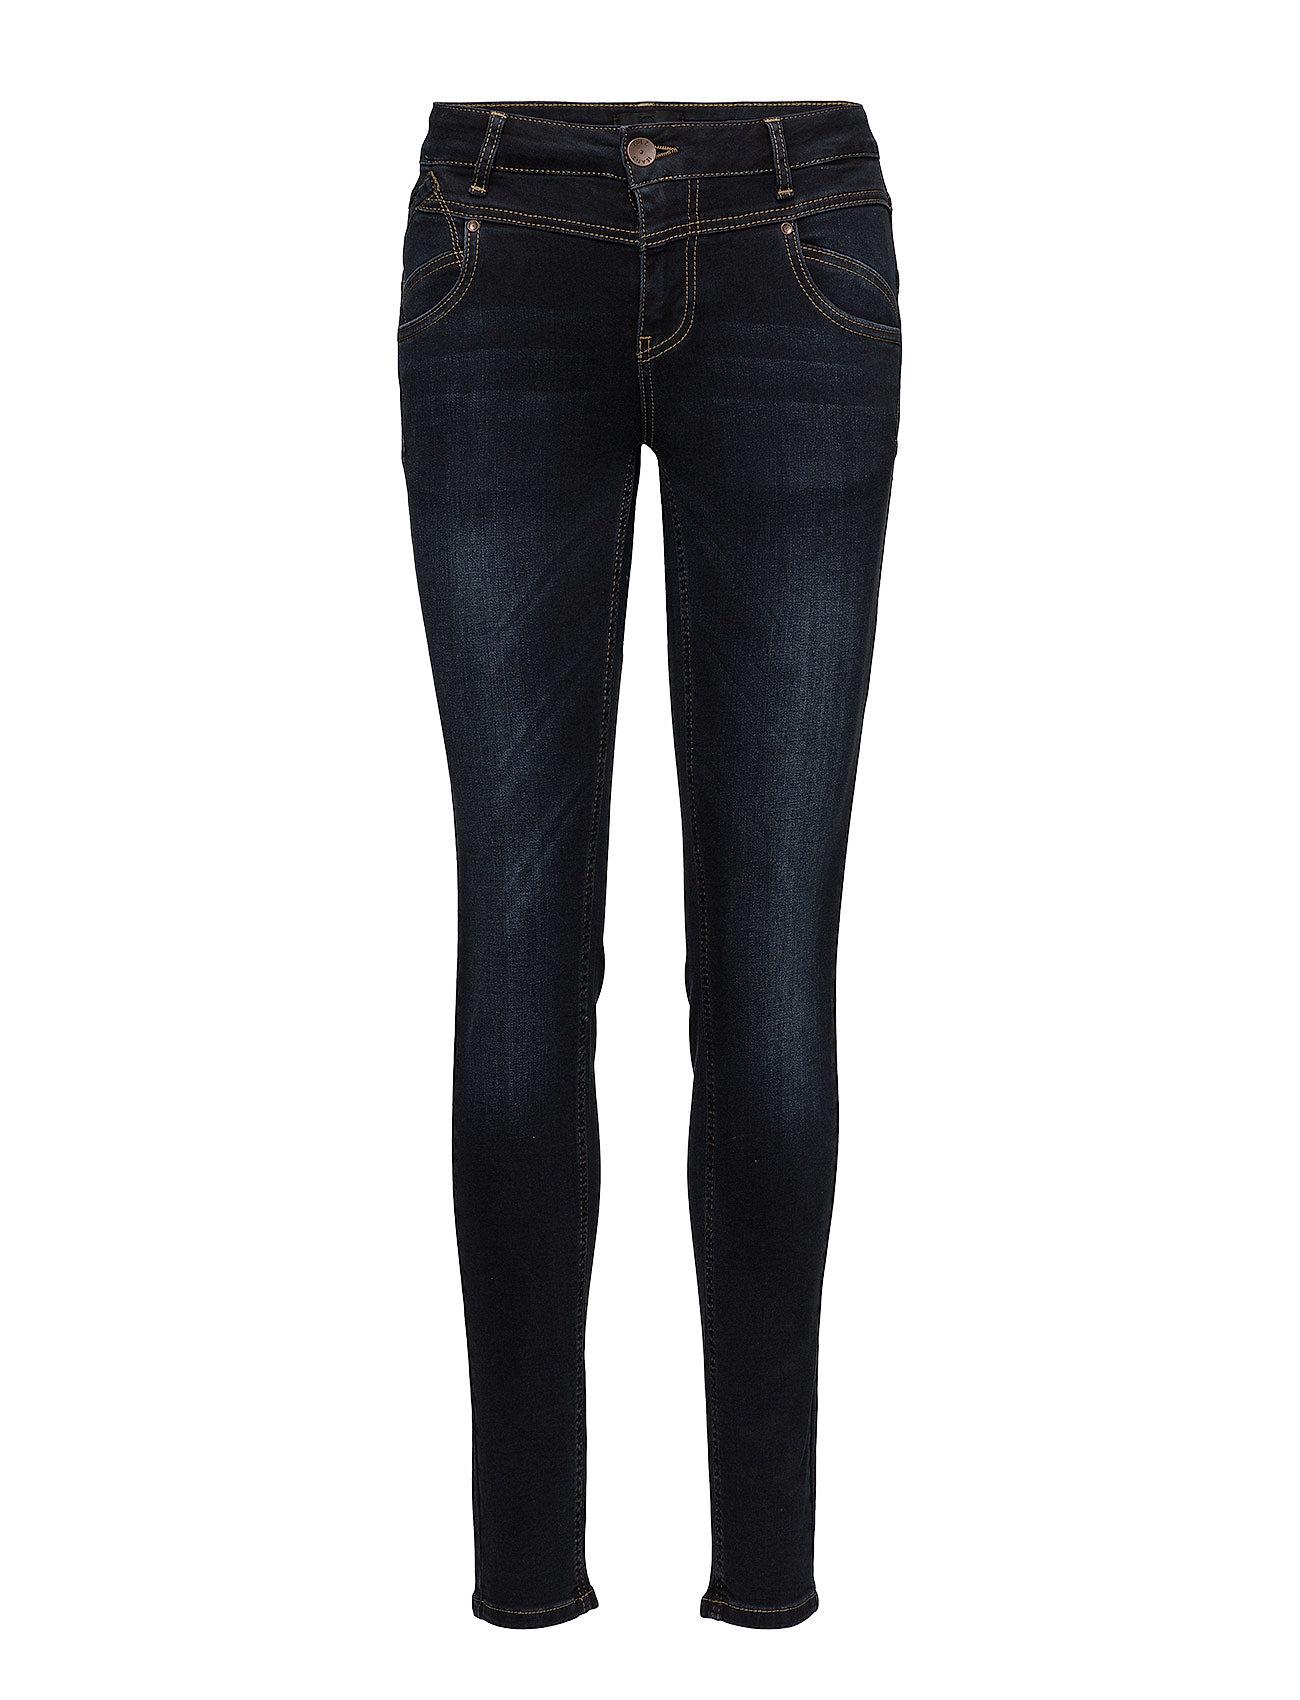 Pulz Jeans Carmen Highwaist Skinny - DARK BLUE